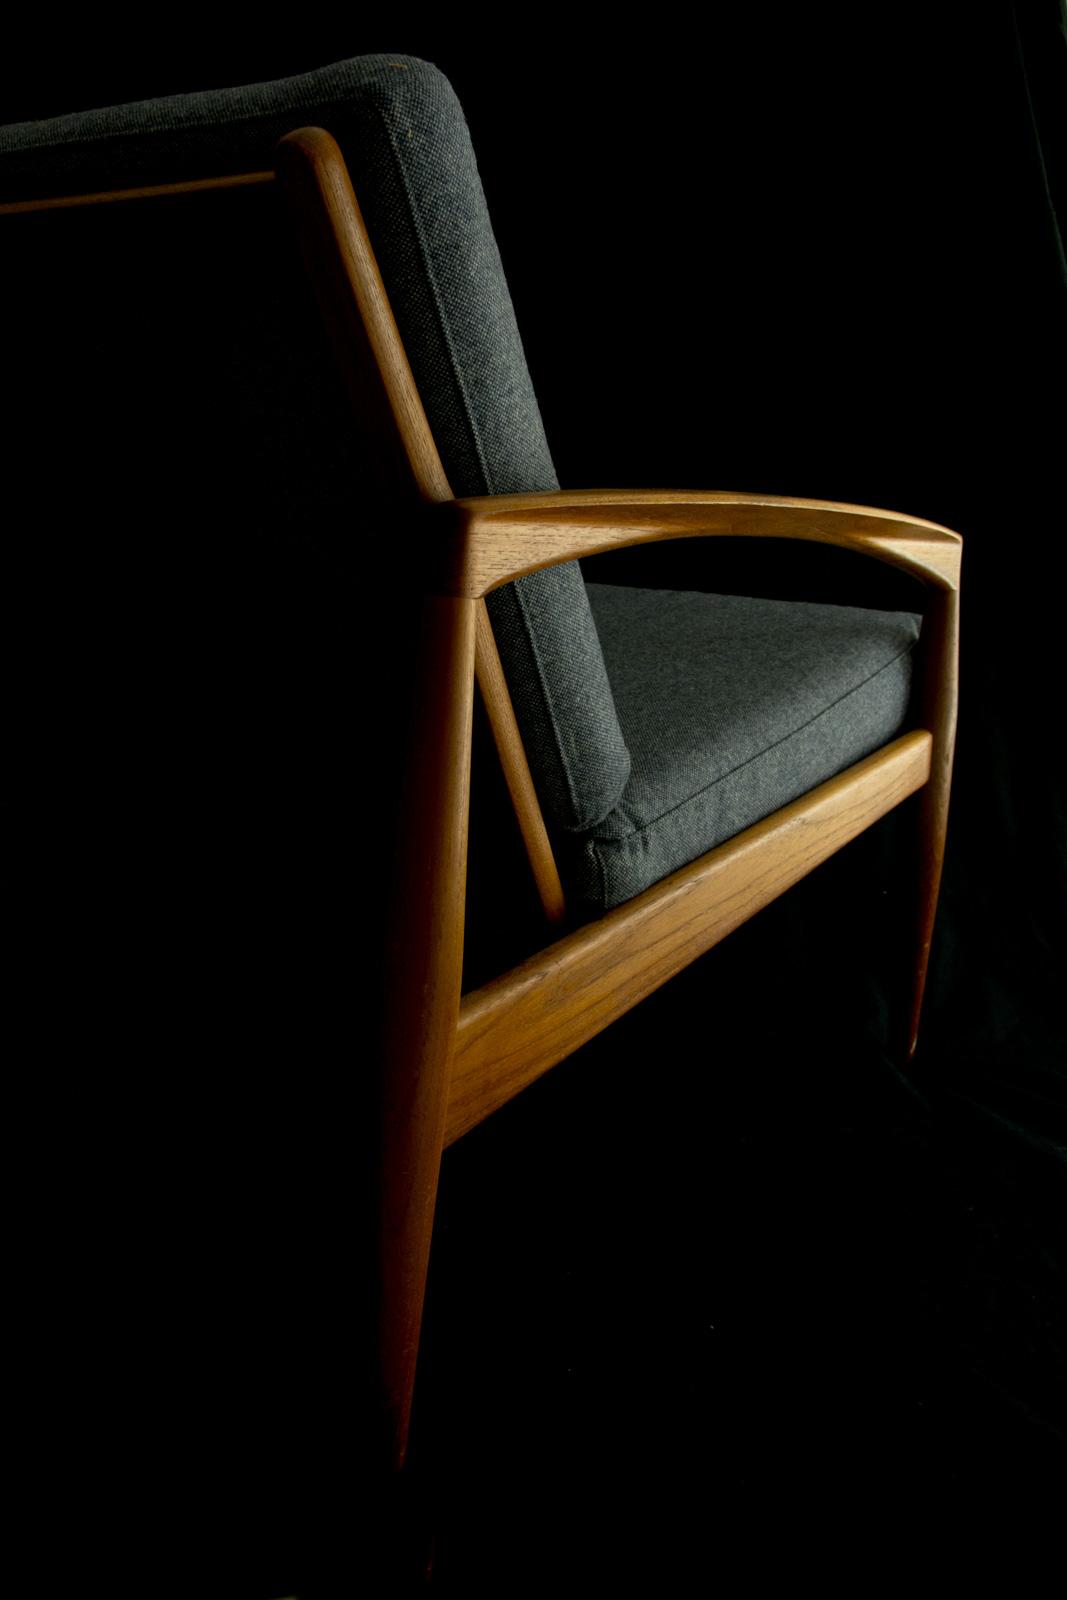 #121 Easy chair by Kai Kristiansen